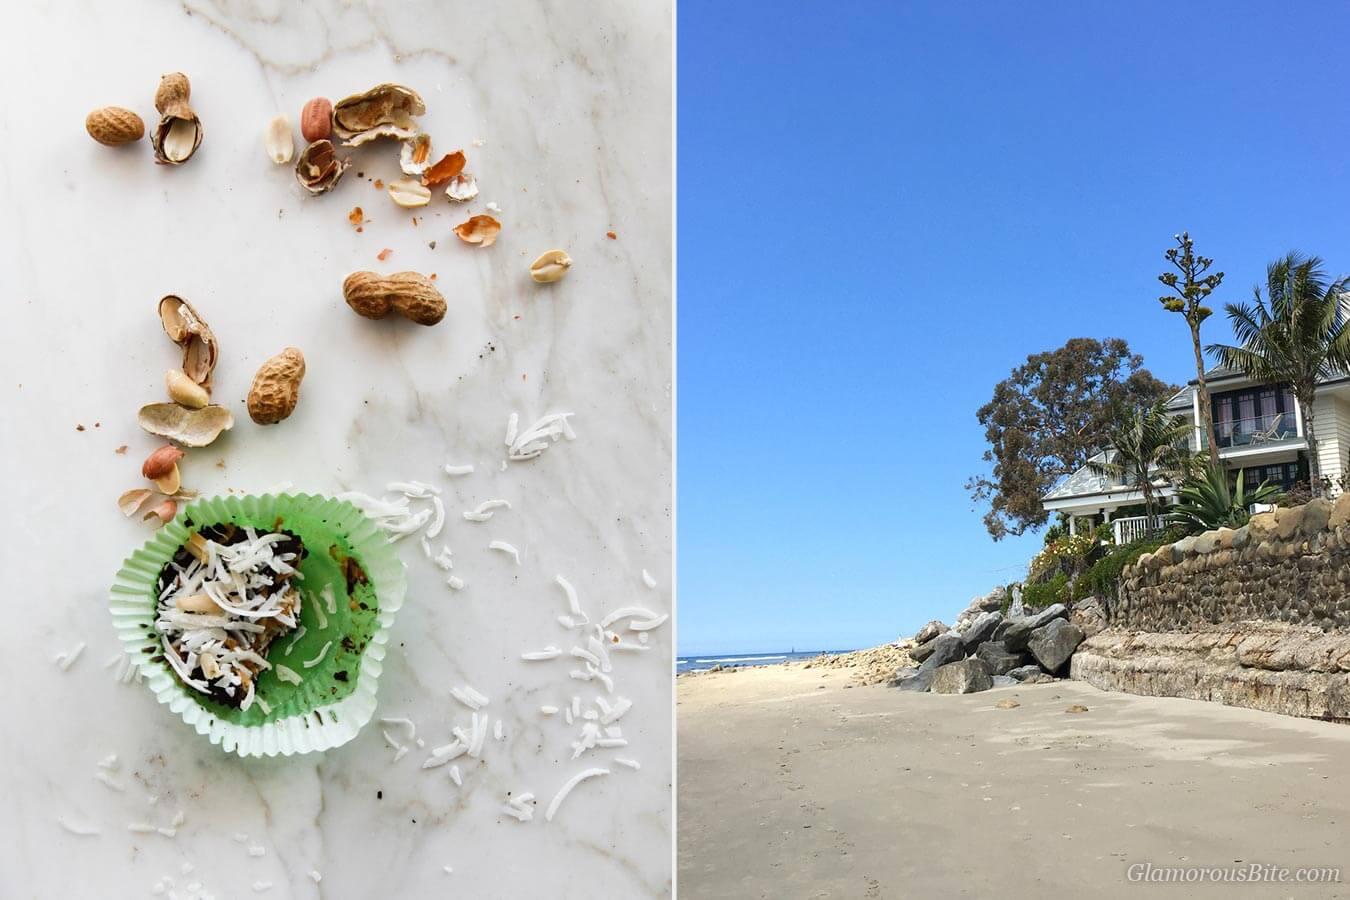 Chocolate Coconut Peanut Butter Cups and Montecito coast